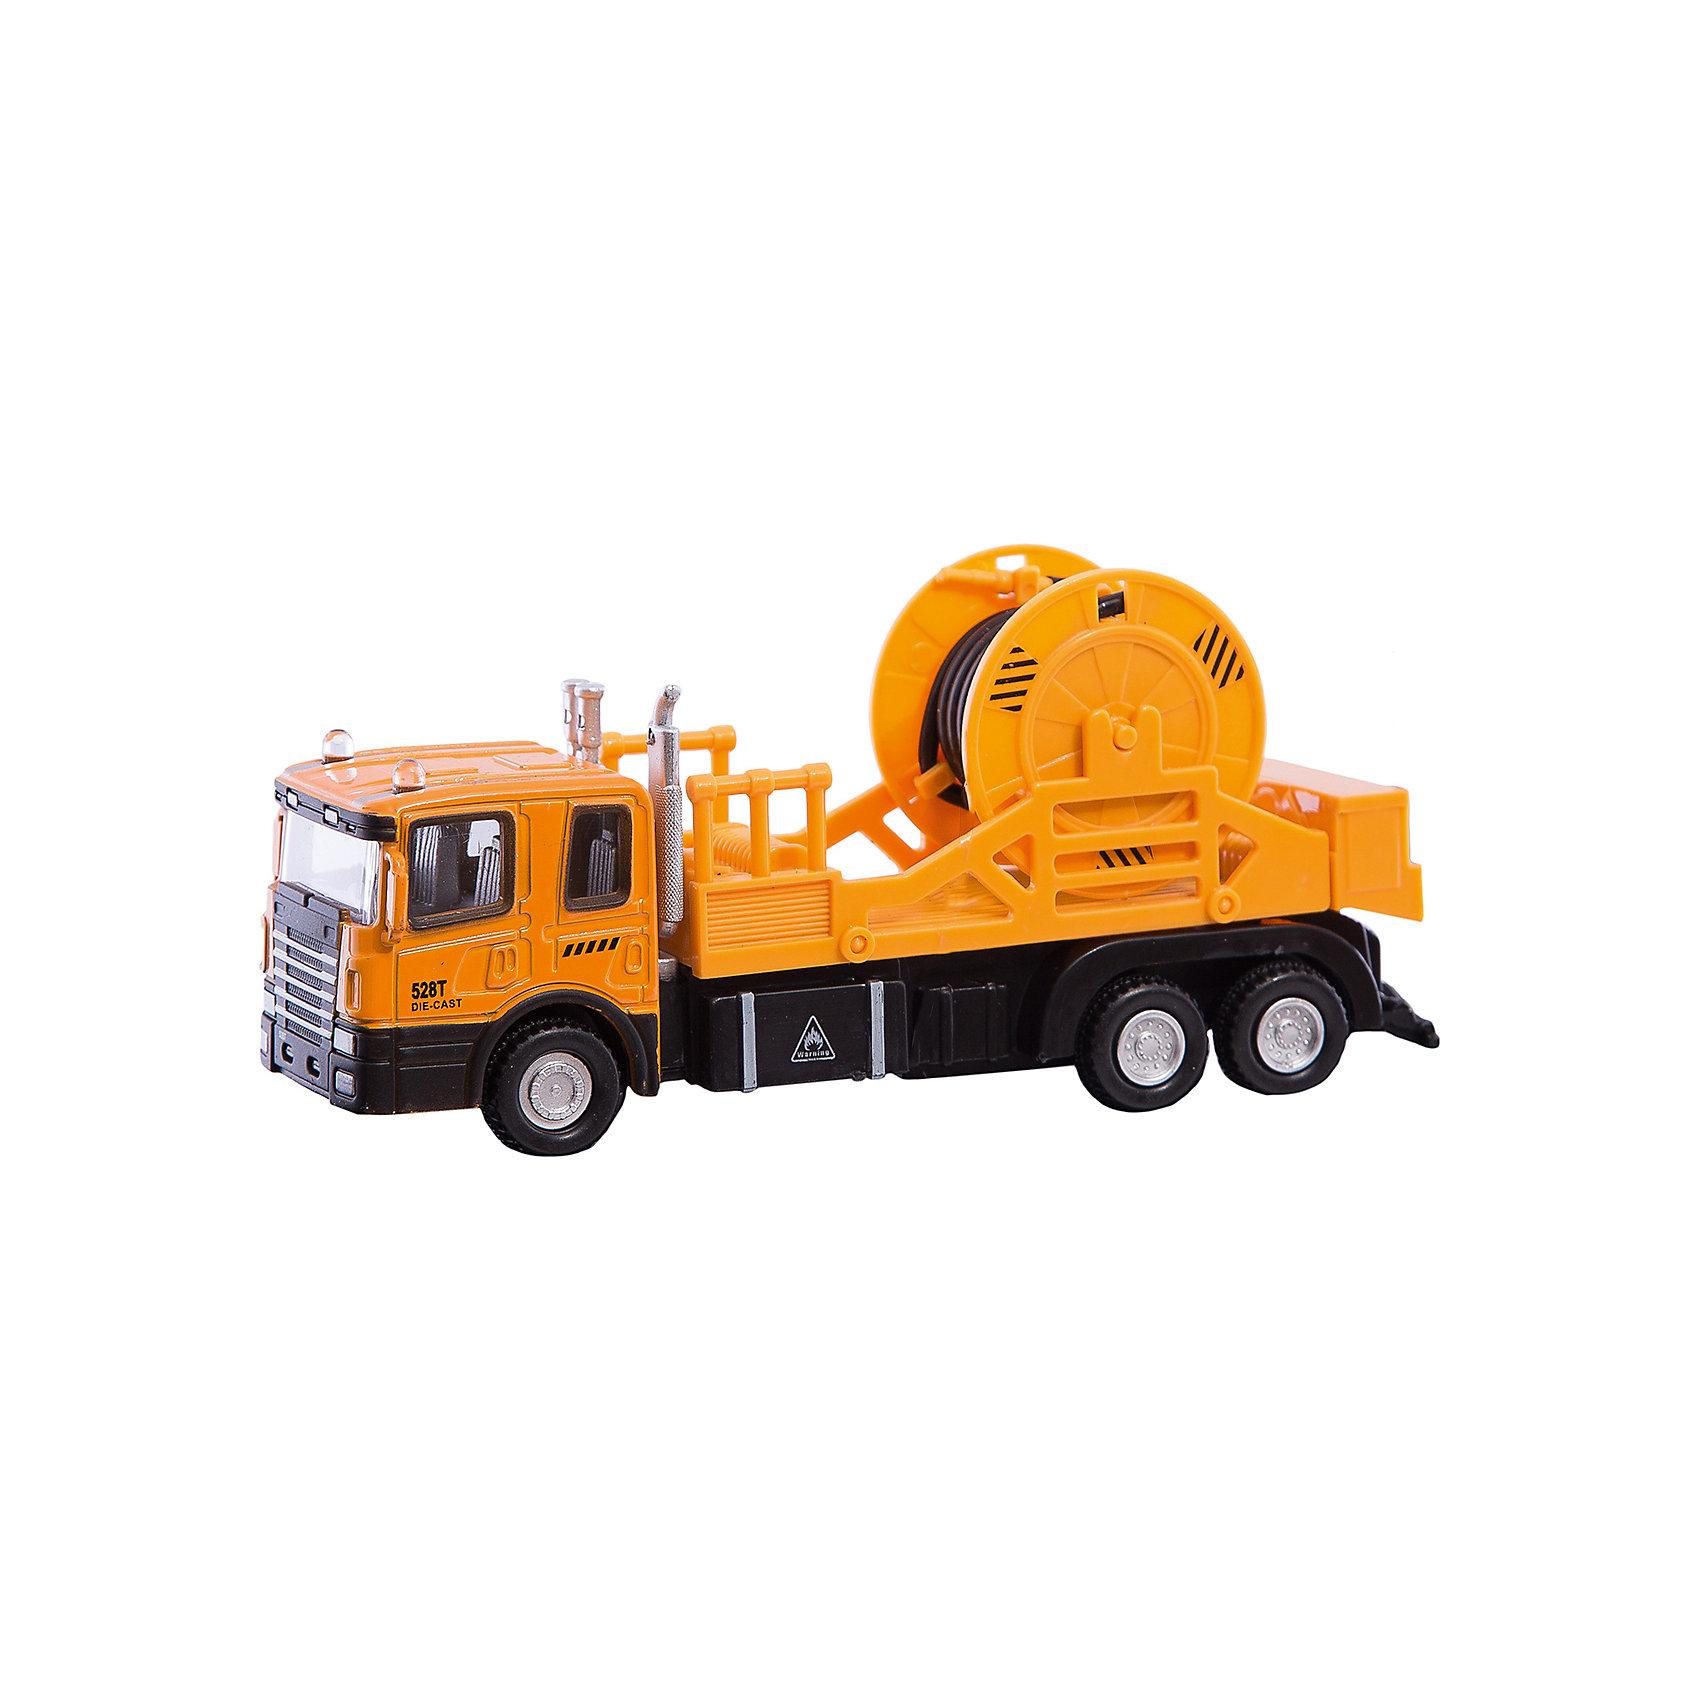 Машинка Mechanic Truck с катушкой 1:48, AutotimeМашинки<br><br><br>Ширина мм: 165<br>Глубина мм: 57<br>Высота мм: 75<br>Вес г: 13<br>Возраст от месяцев: 36<br>Возраст до месяцев: 2147483647<br>Пол: Мужской<br>Возраст: Детский<br>SKU: 5584053